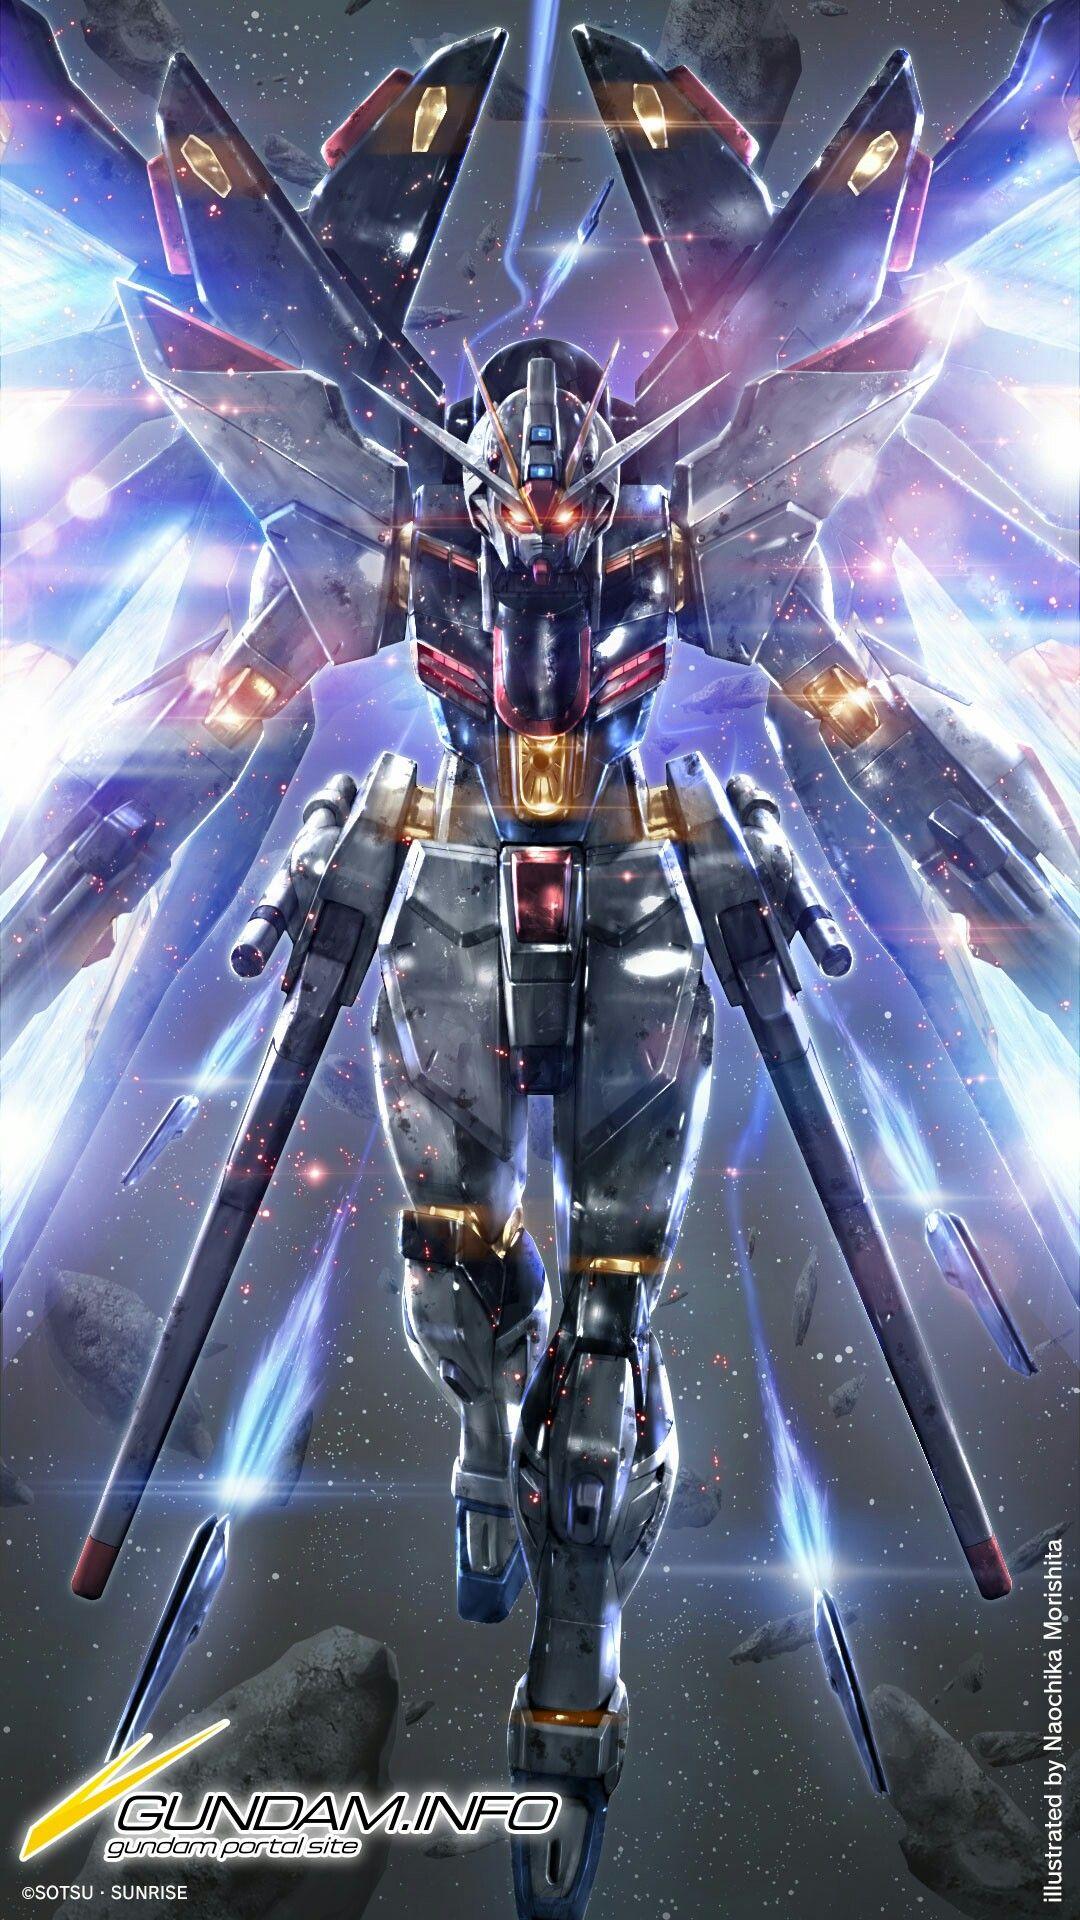 Unicorn Gundam Wallpaper Hd Posted By Sarah Tremblay